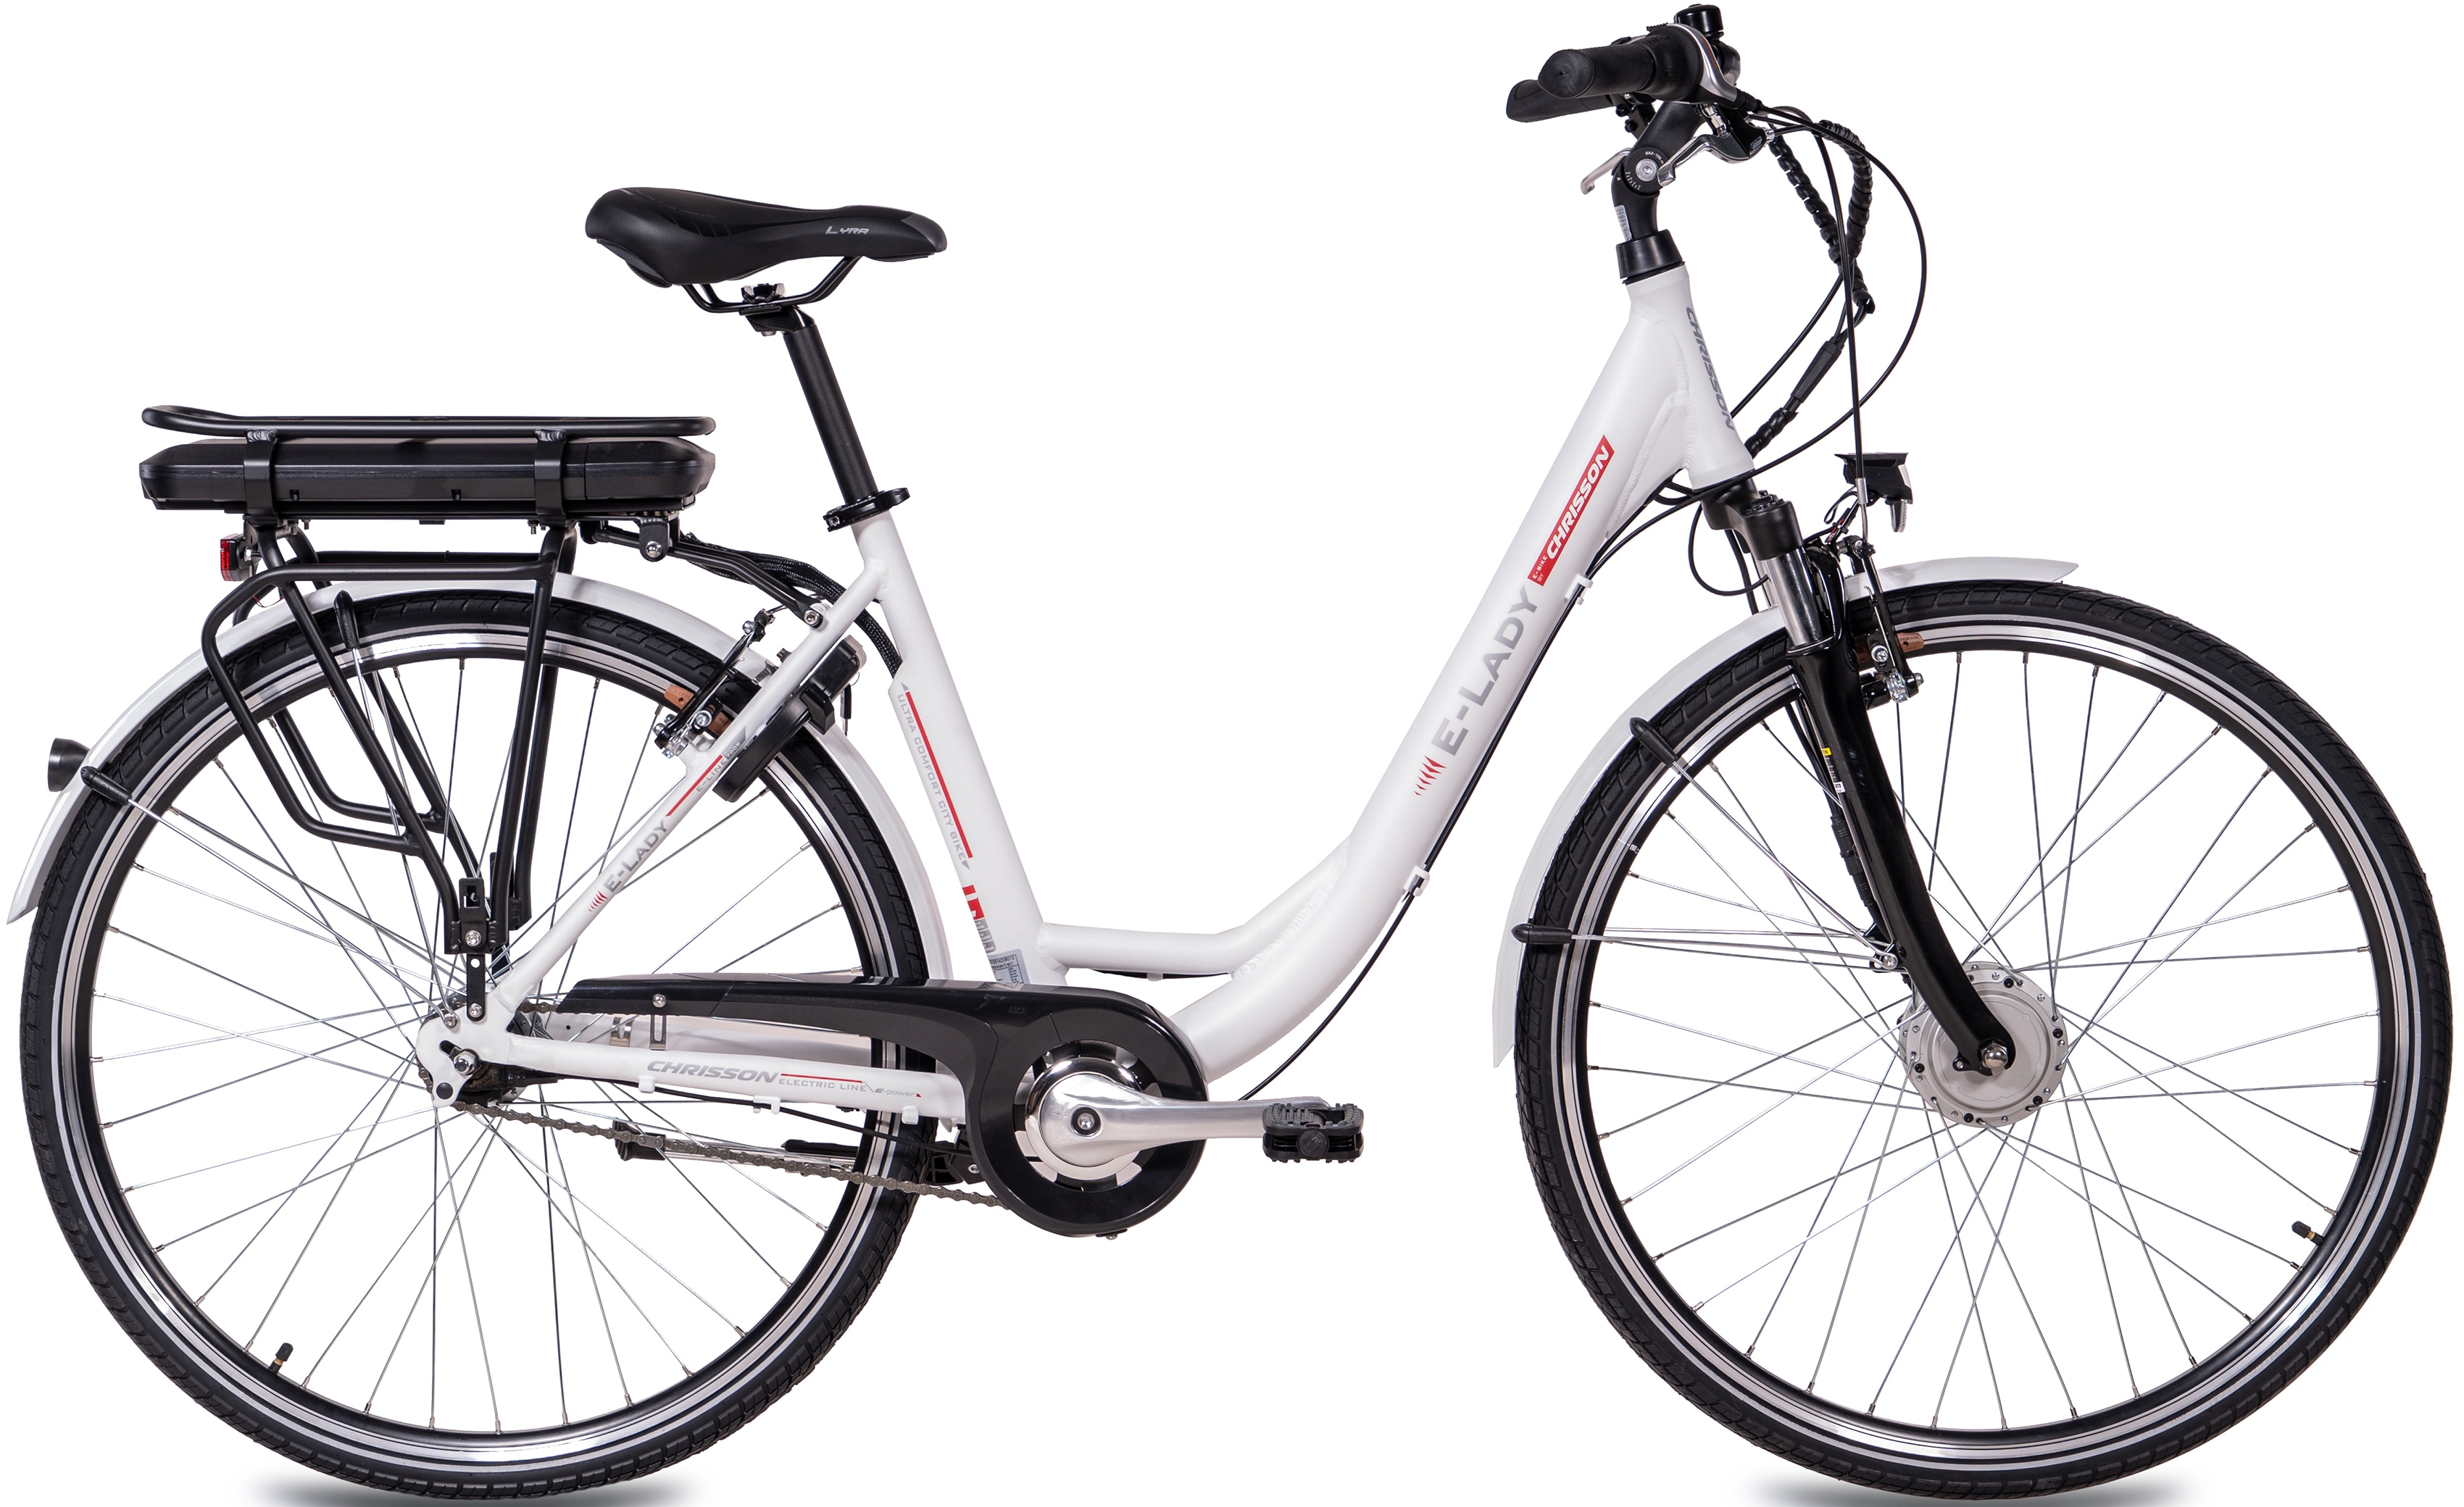 Chrisson E-Bike E-LADY, 8 Gang, Shimano, SG-C3000-7C, Frontmotor 250 W weiß E-Bikes Fahrräder Zubehör